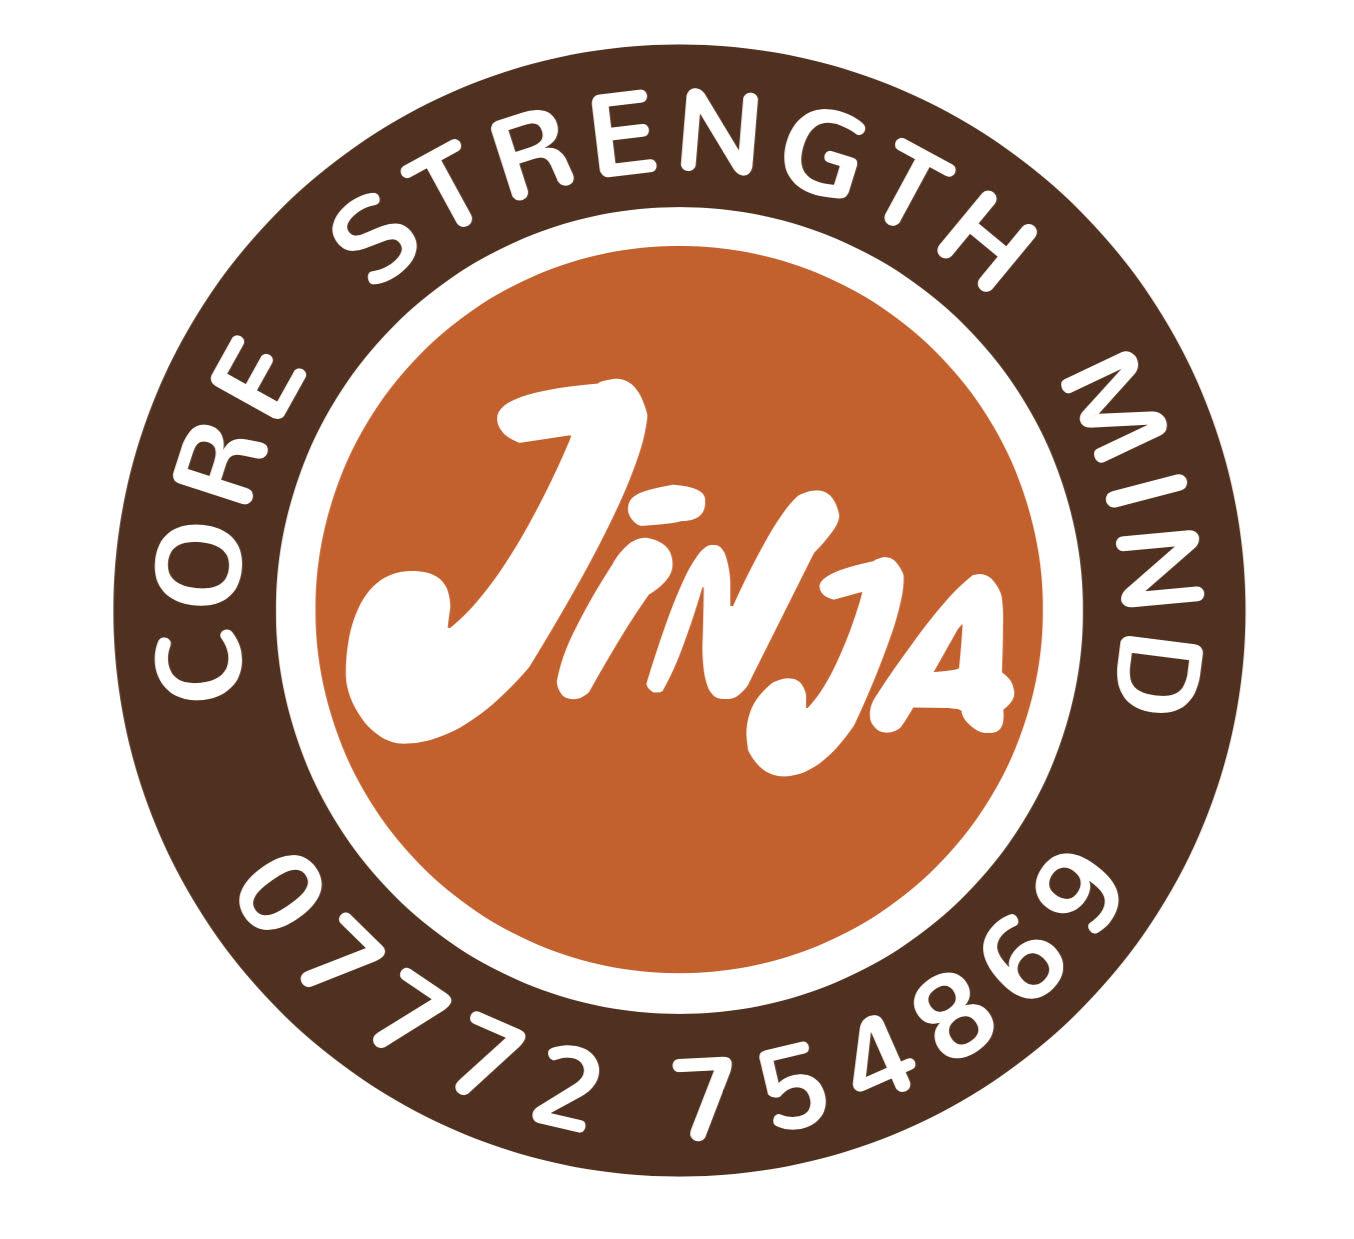 Jinja Body Fitness's logo